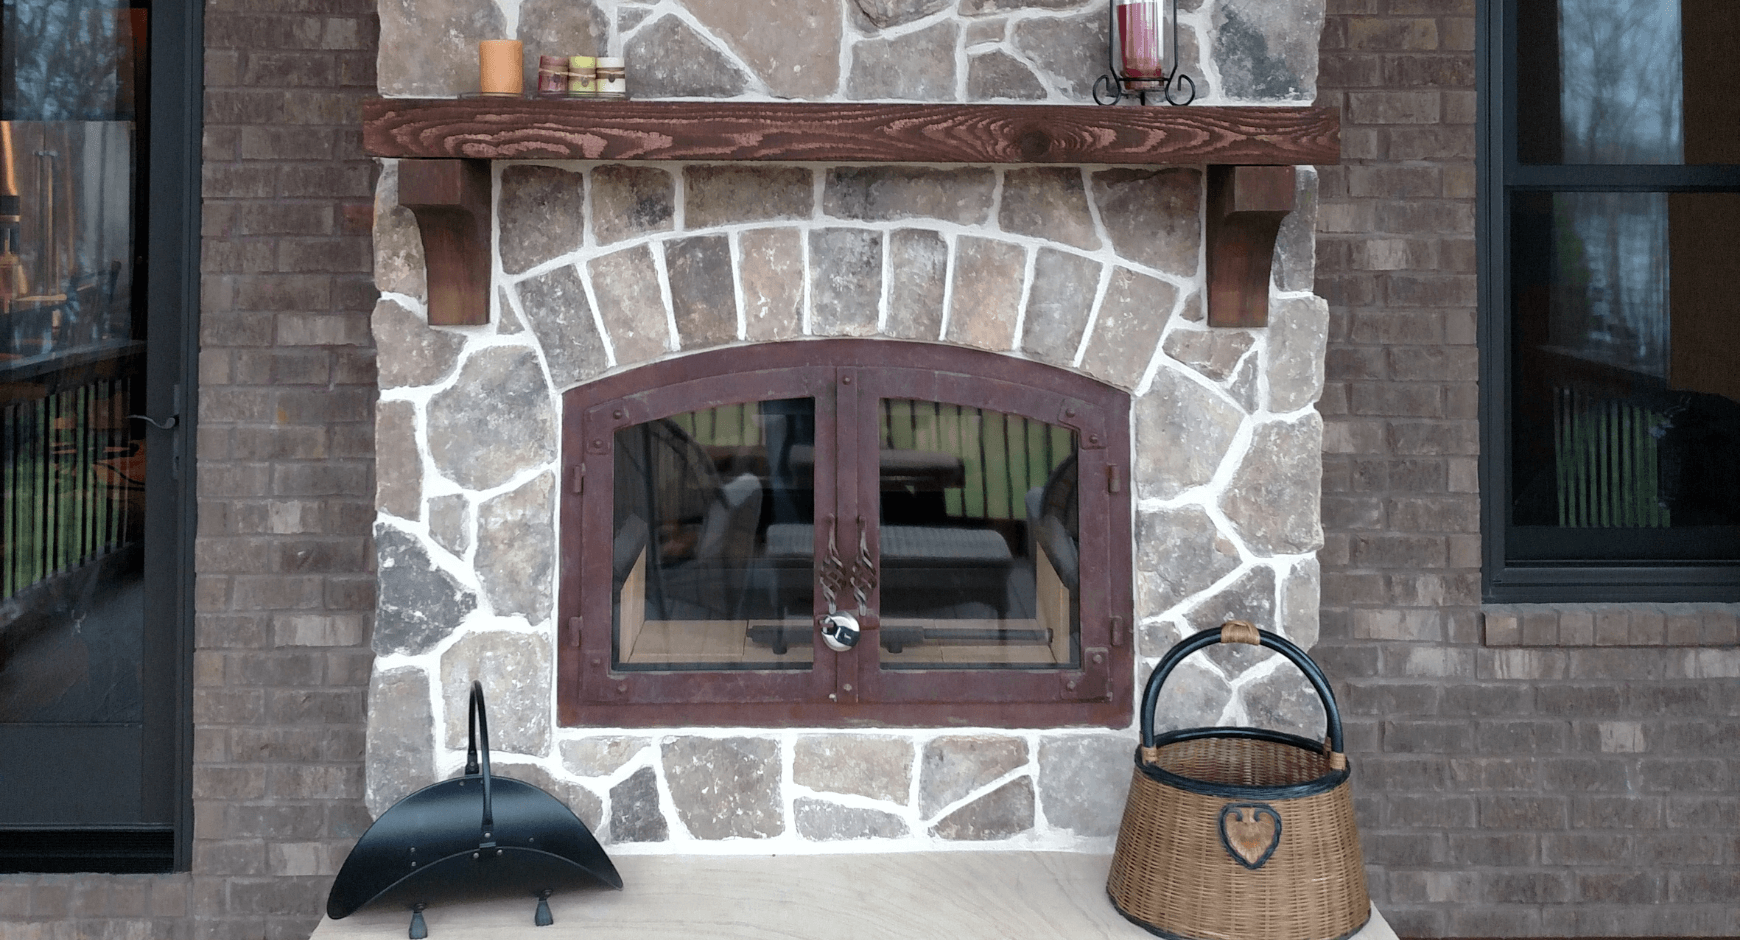 Mortared stone veneer around an iron door fireplace